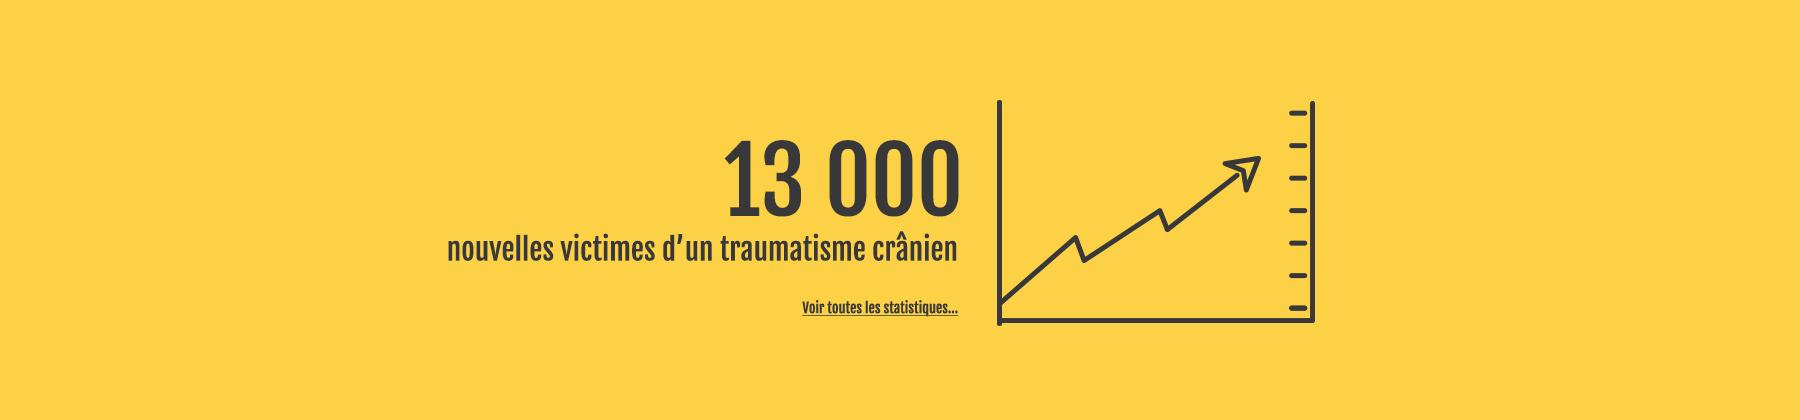 Statistiques 13000